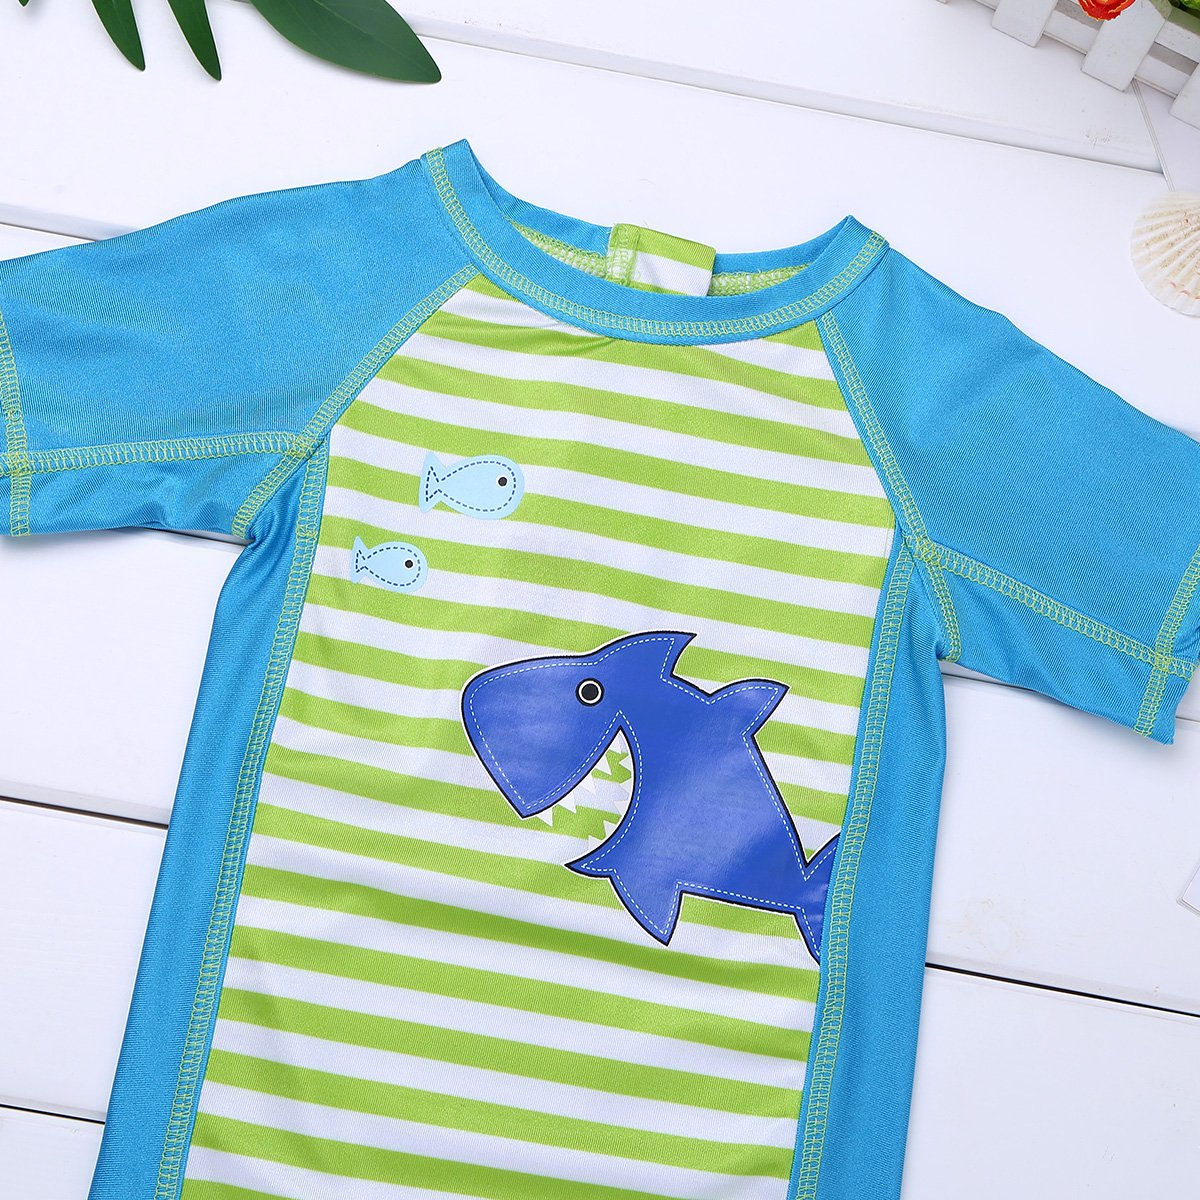 TiaoBug Baby Boys Girls Short Sleeve Shark Rash Guard Shirts Zippered Striped Swimsuit Swimwear UPF 50+Sunsuits